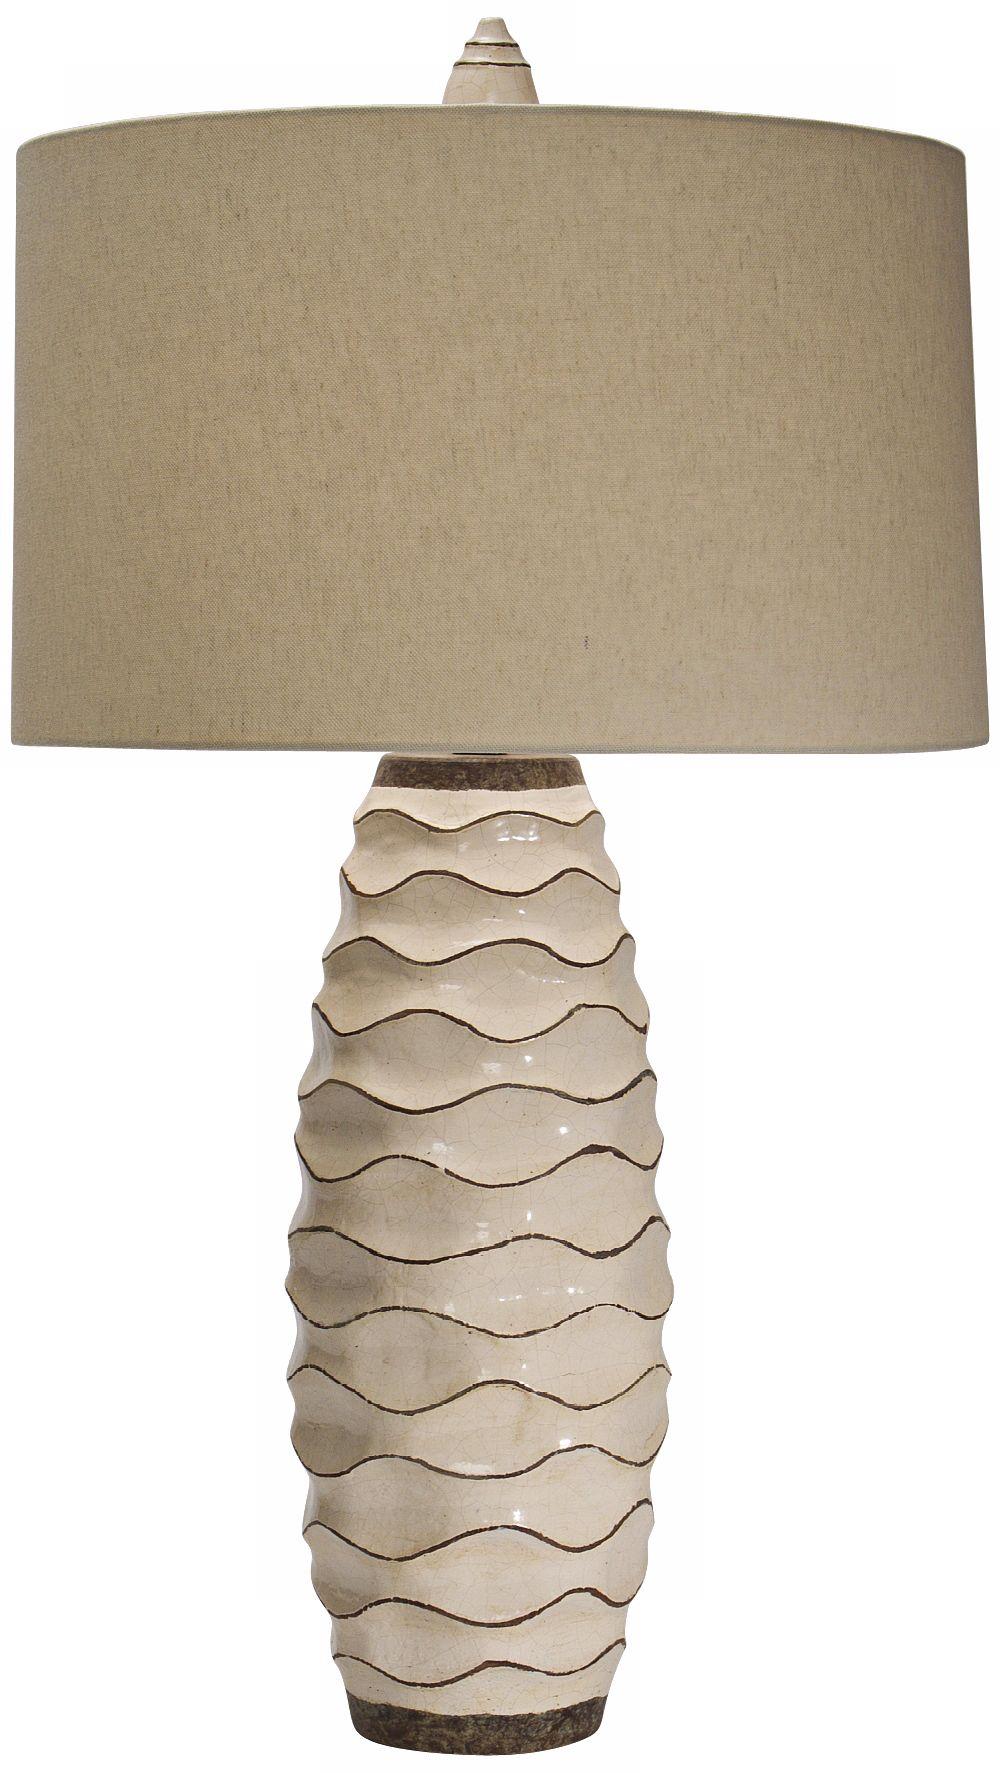 Superb Natural Light Ebbtide Pottery Table Lamp